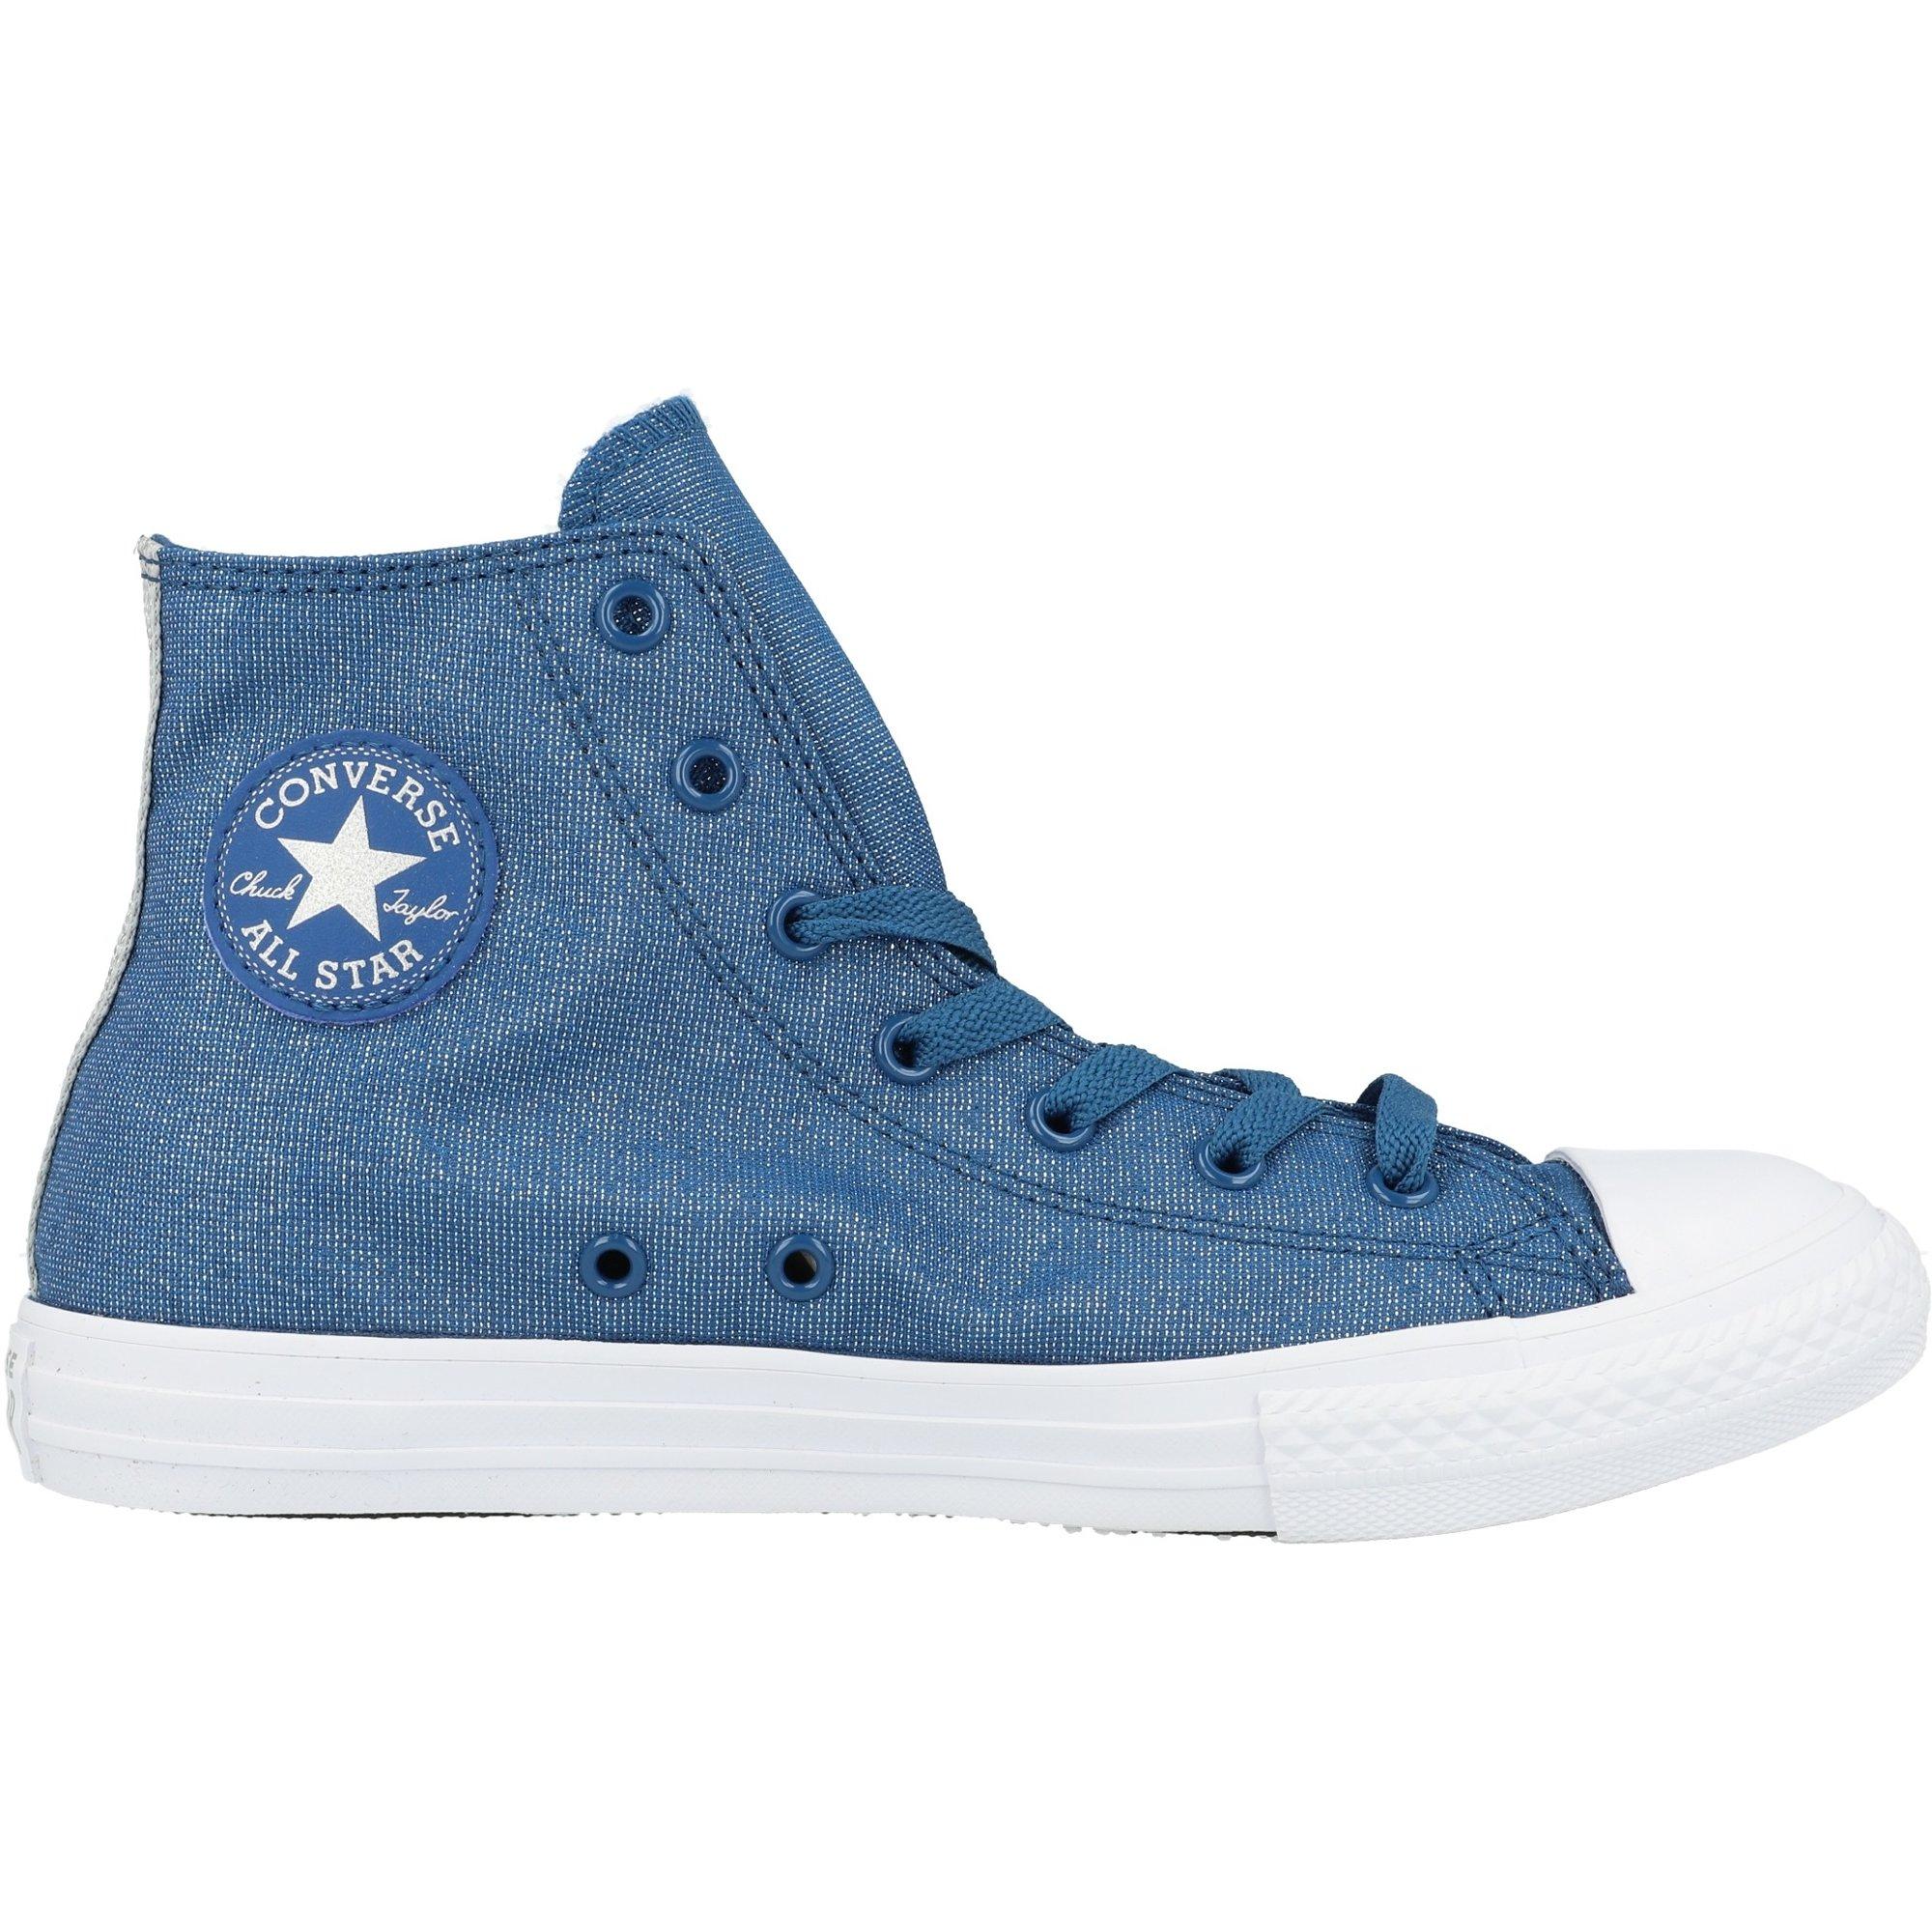 Converse Chuck Taylor All Star Fairy Dust Hi Court Blue